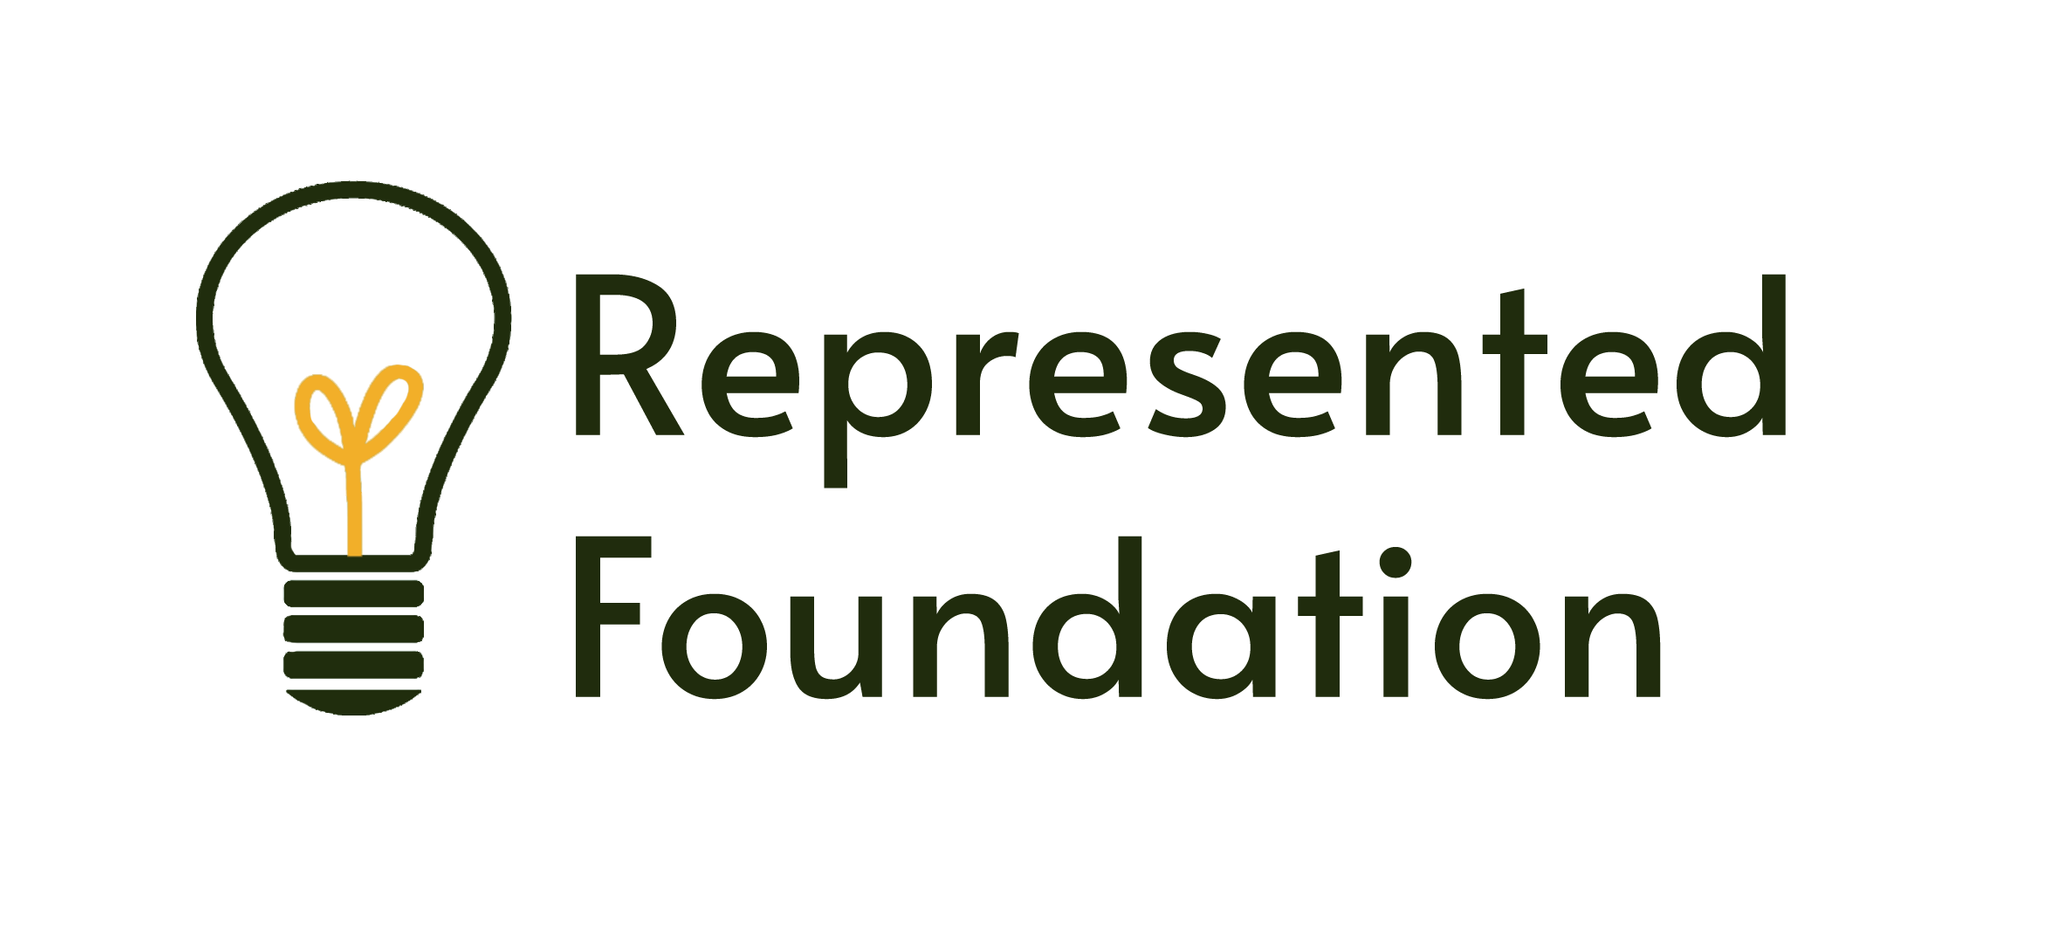 Represented Foundation